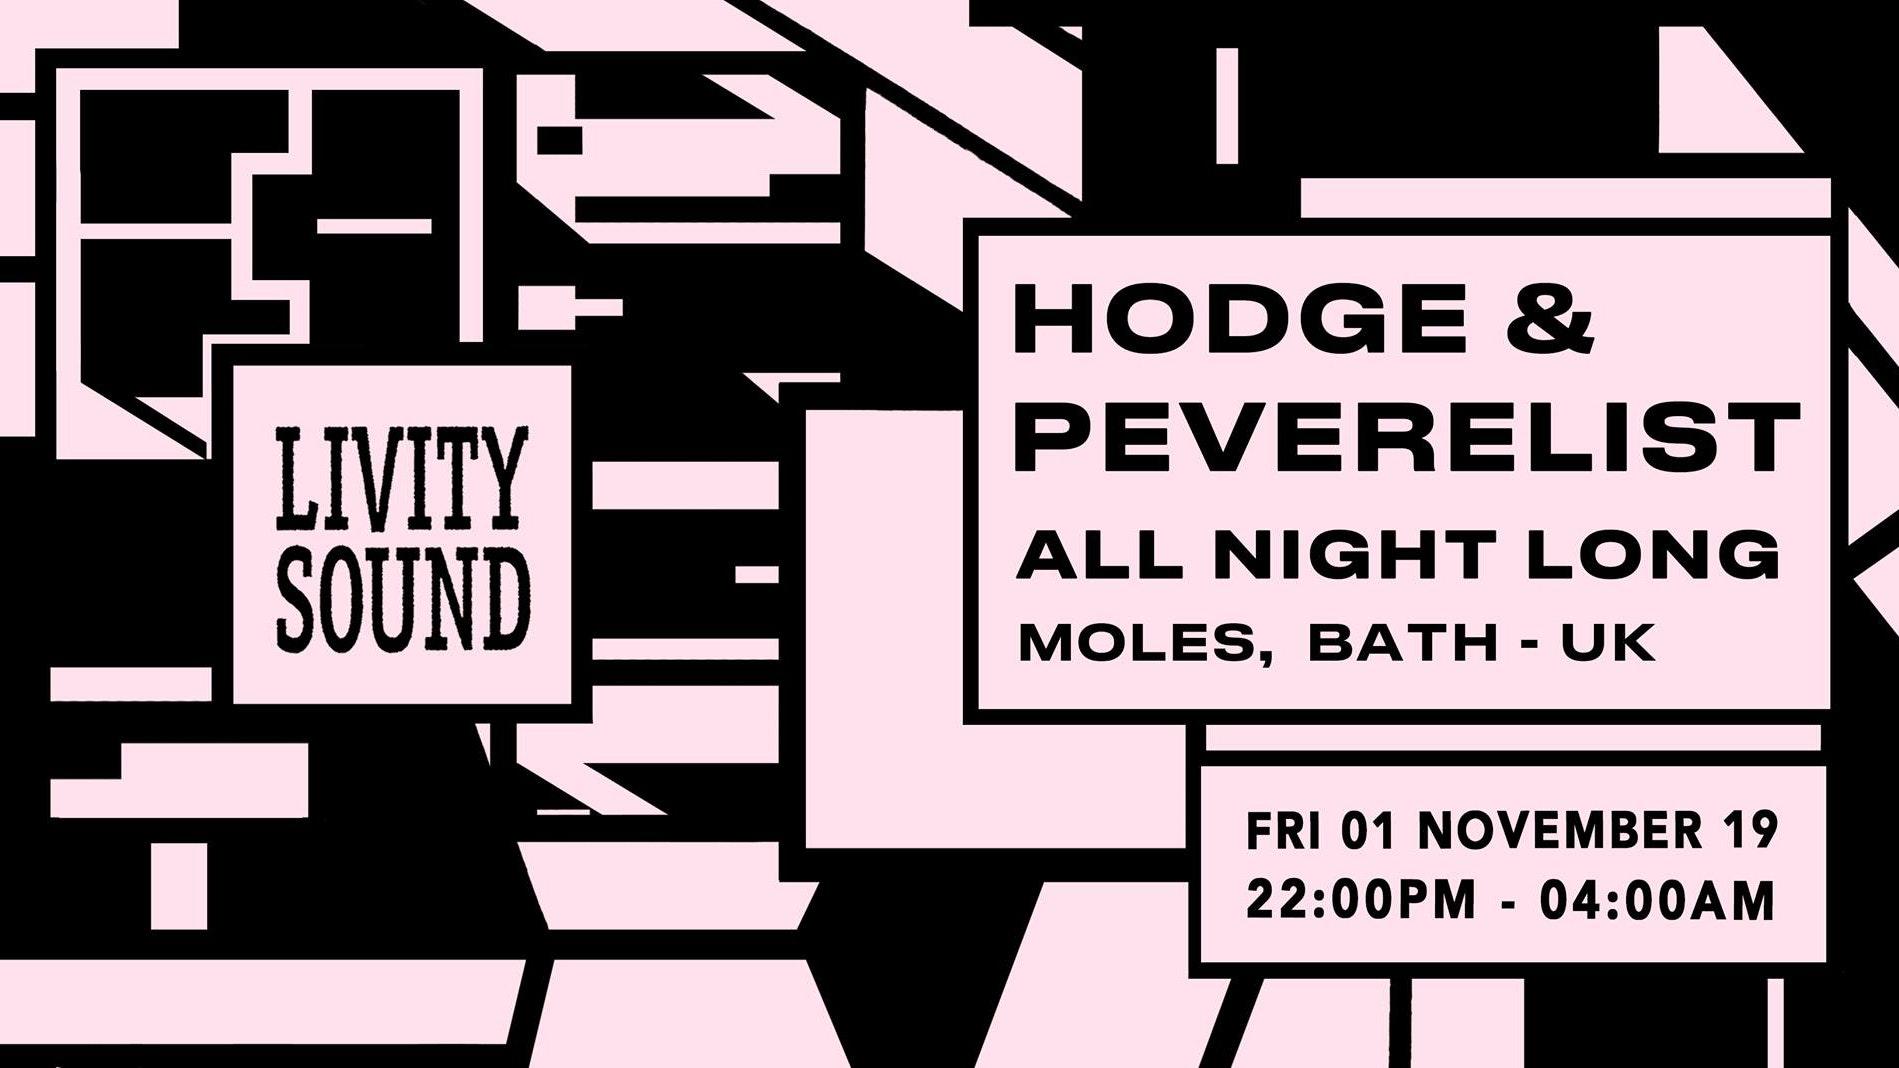 Livity Sound w/ Hodge & Peverelist